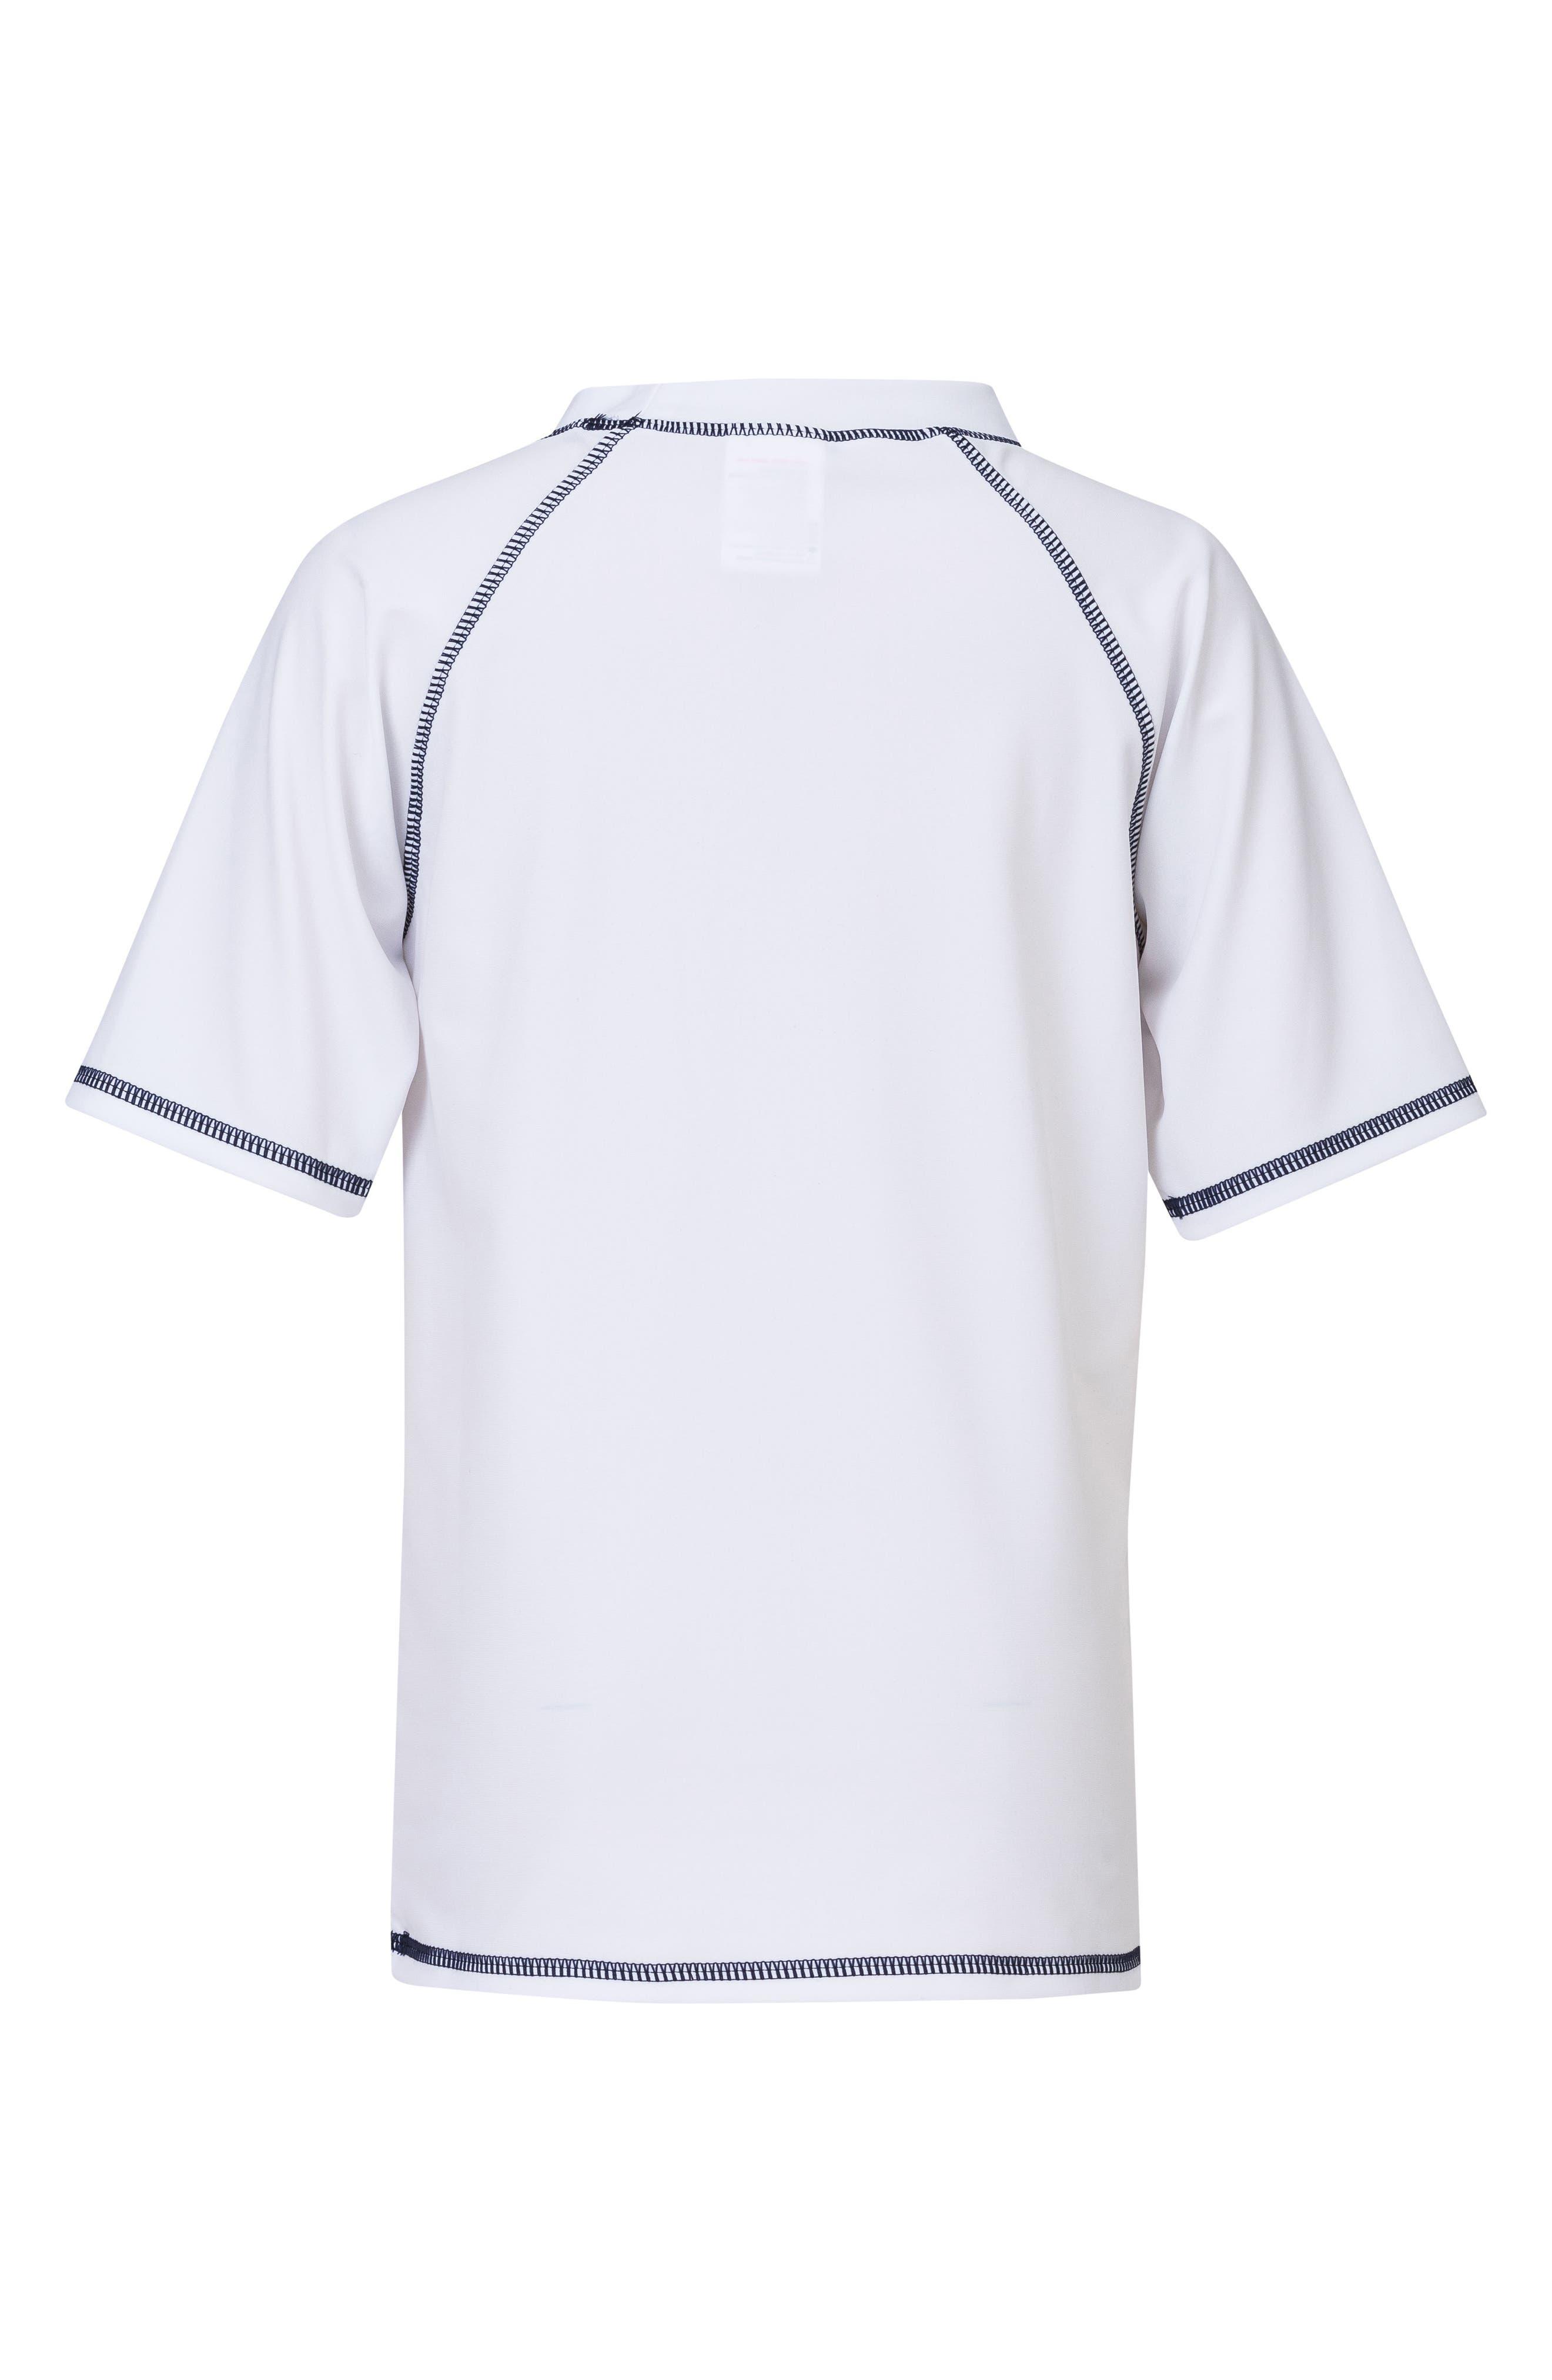 Raglan Short Sleeve Rashguard,                             Alternate thumbnail 2, color,                             White/ Navy